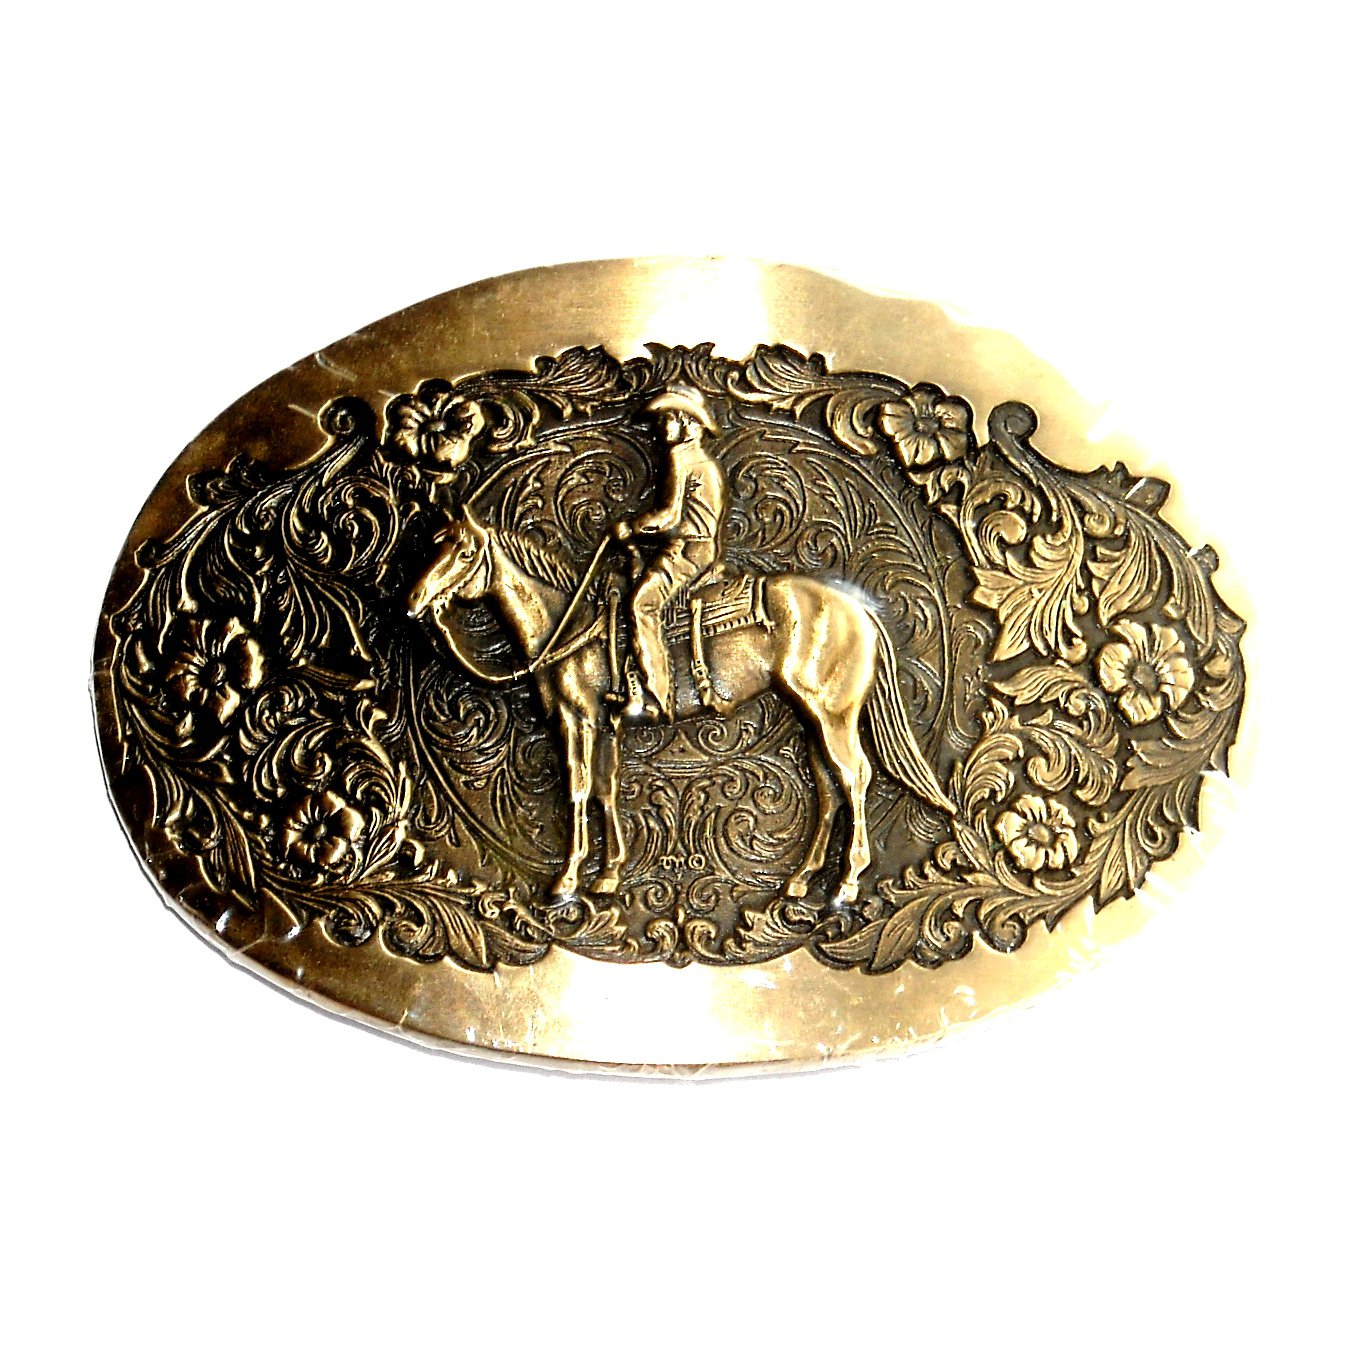 Cowboy Award Design Solid Brass Belt Buckle